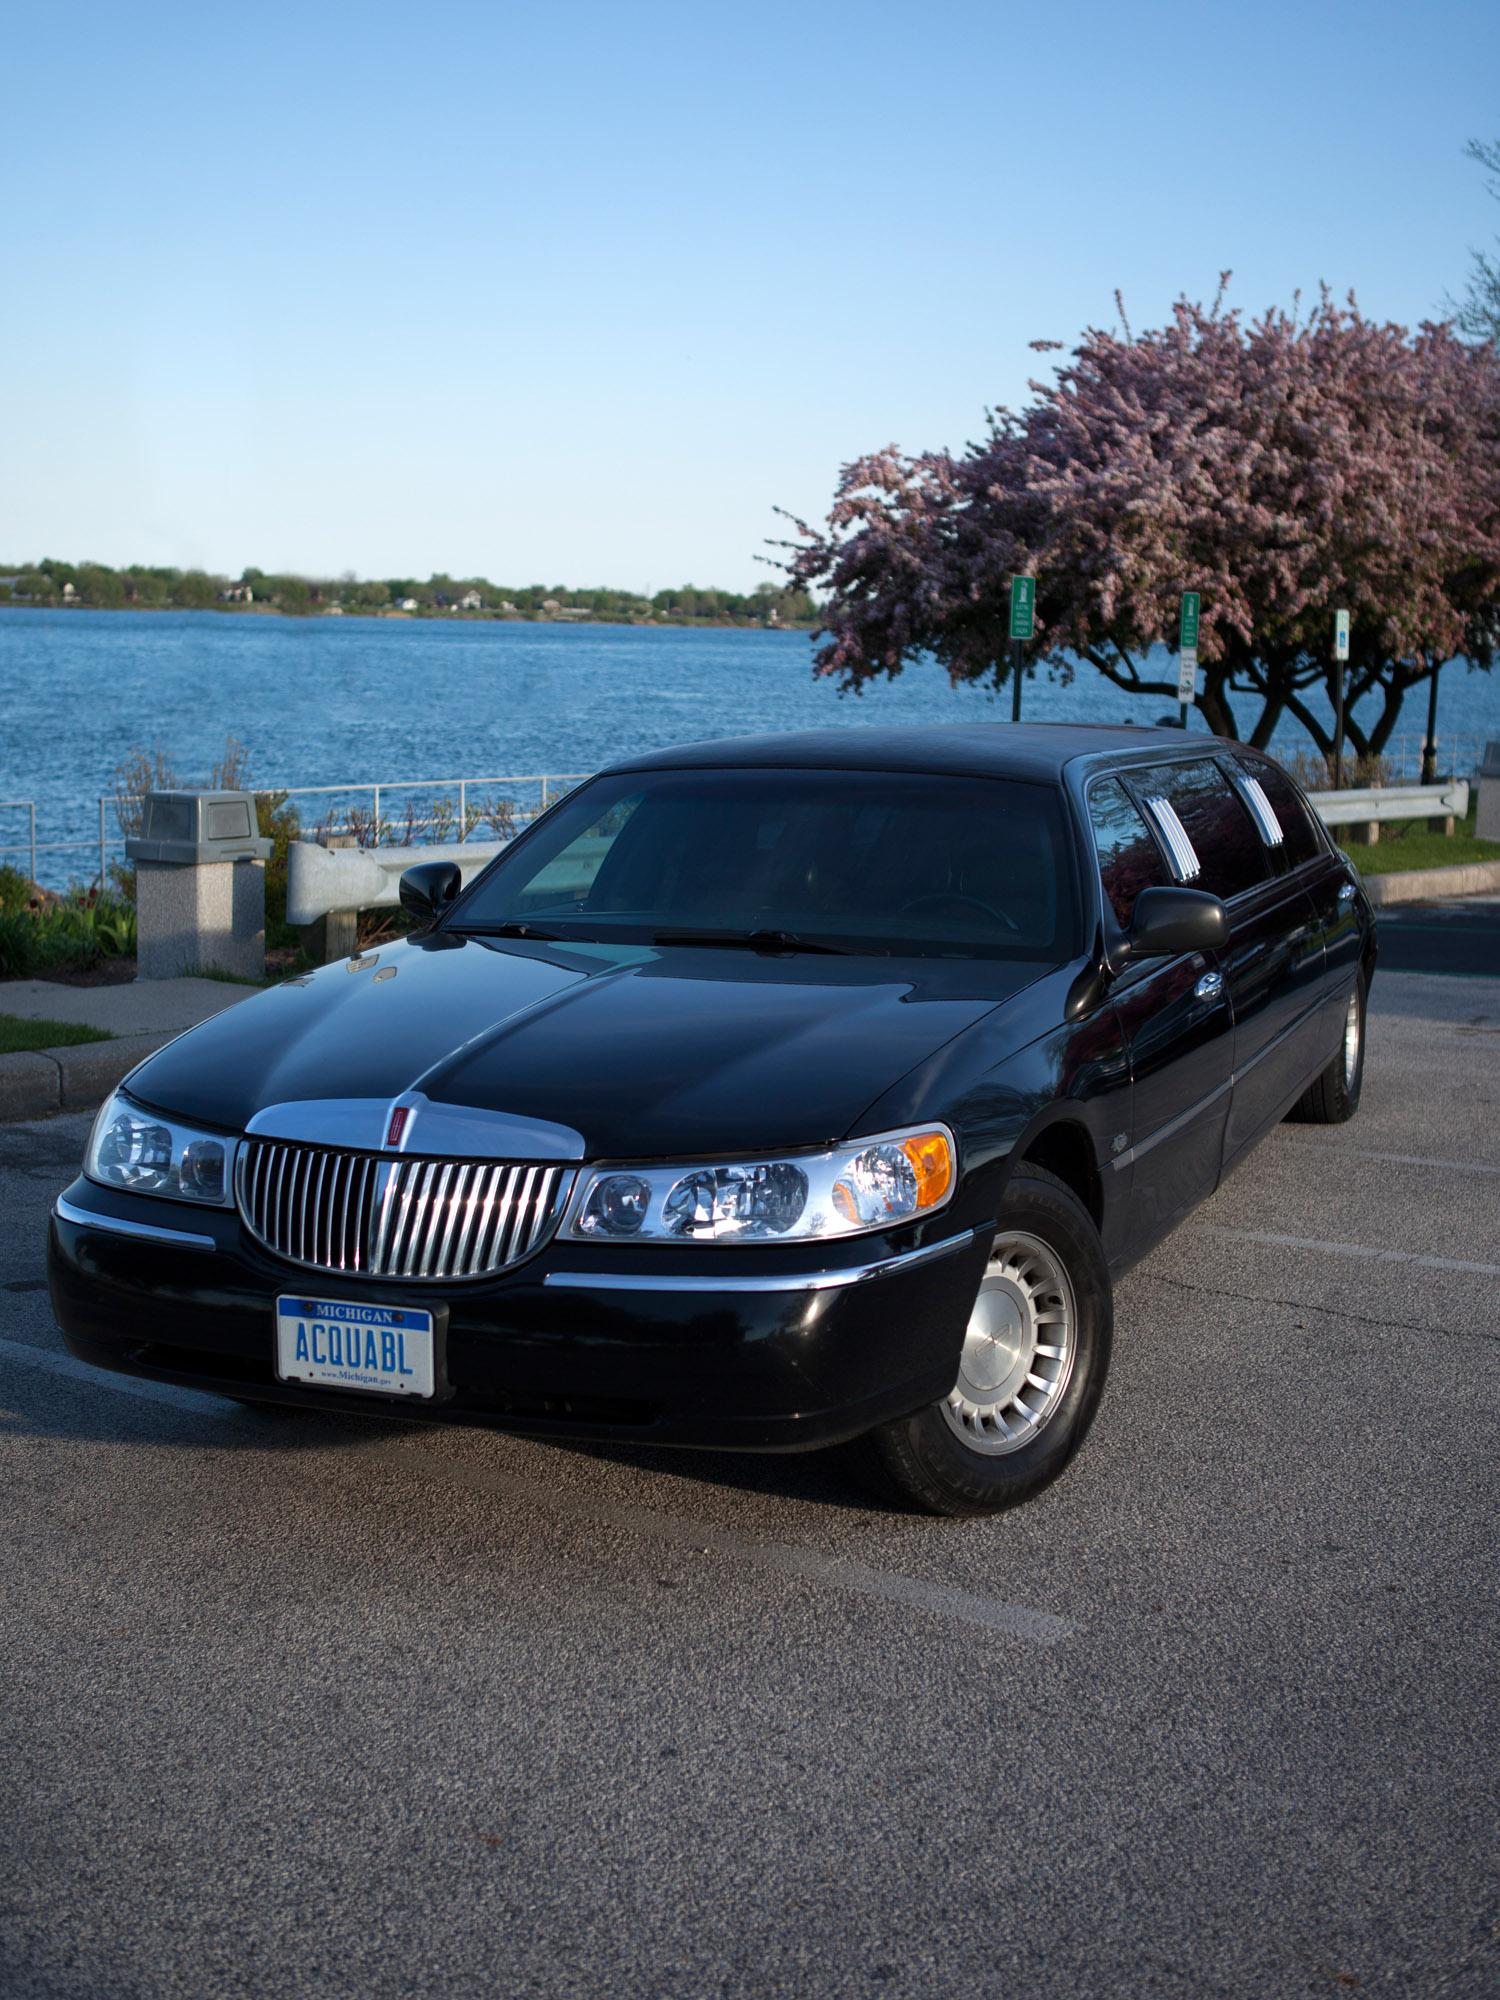 Airport Shuttle and Limousine Services | Port Huron, MI